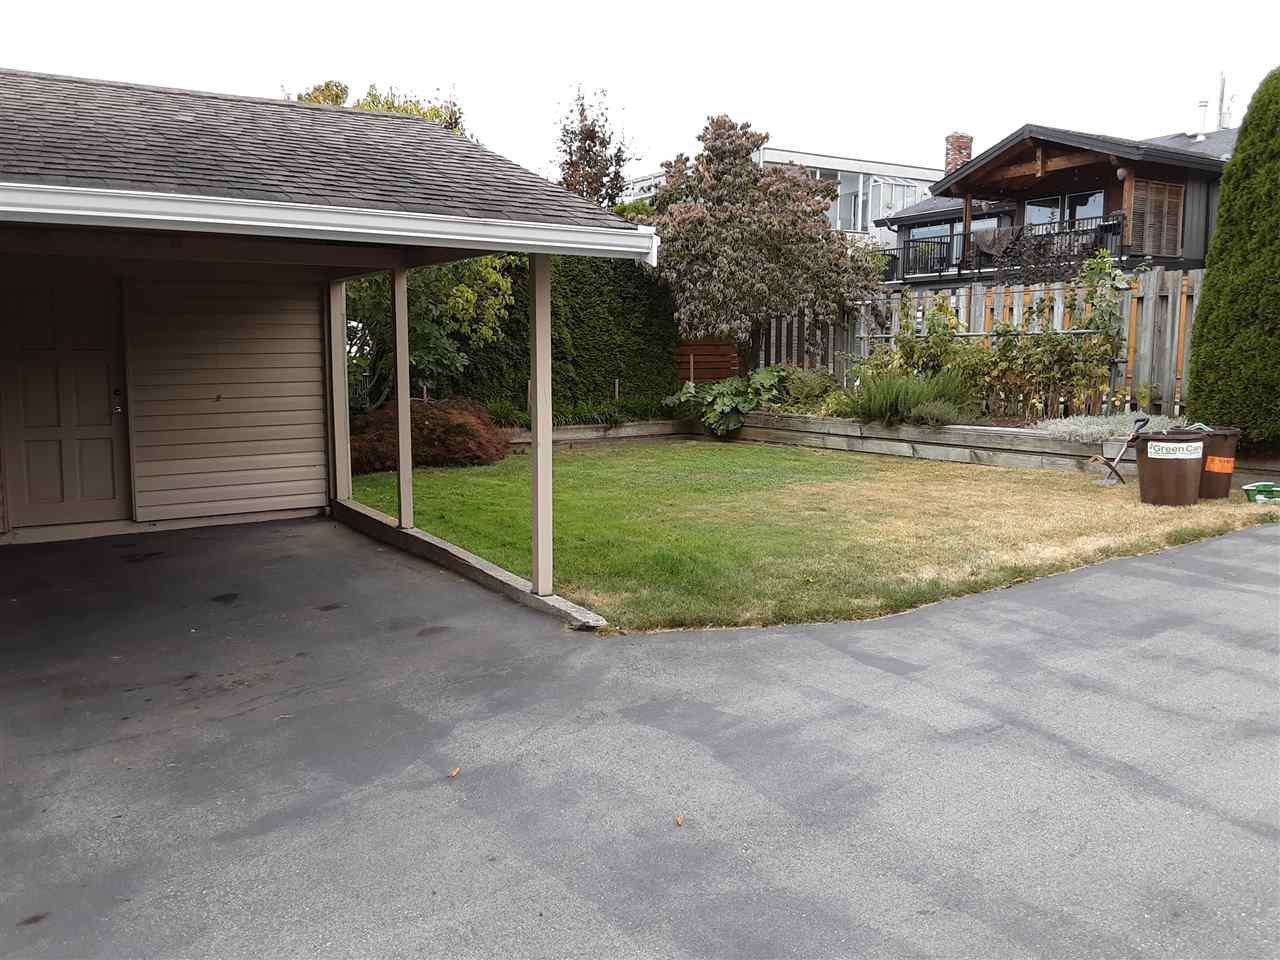 Photo 31: Photos: 15291 COLUMBIA Avenue: White Rock House for sale (South Surrey White Rock)  : MLS®# R2492863